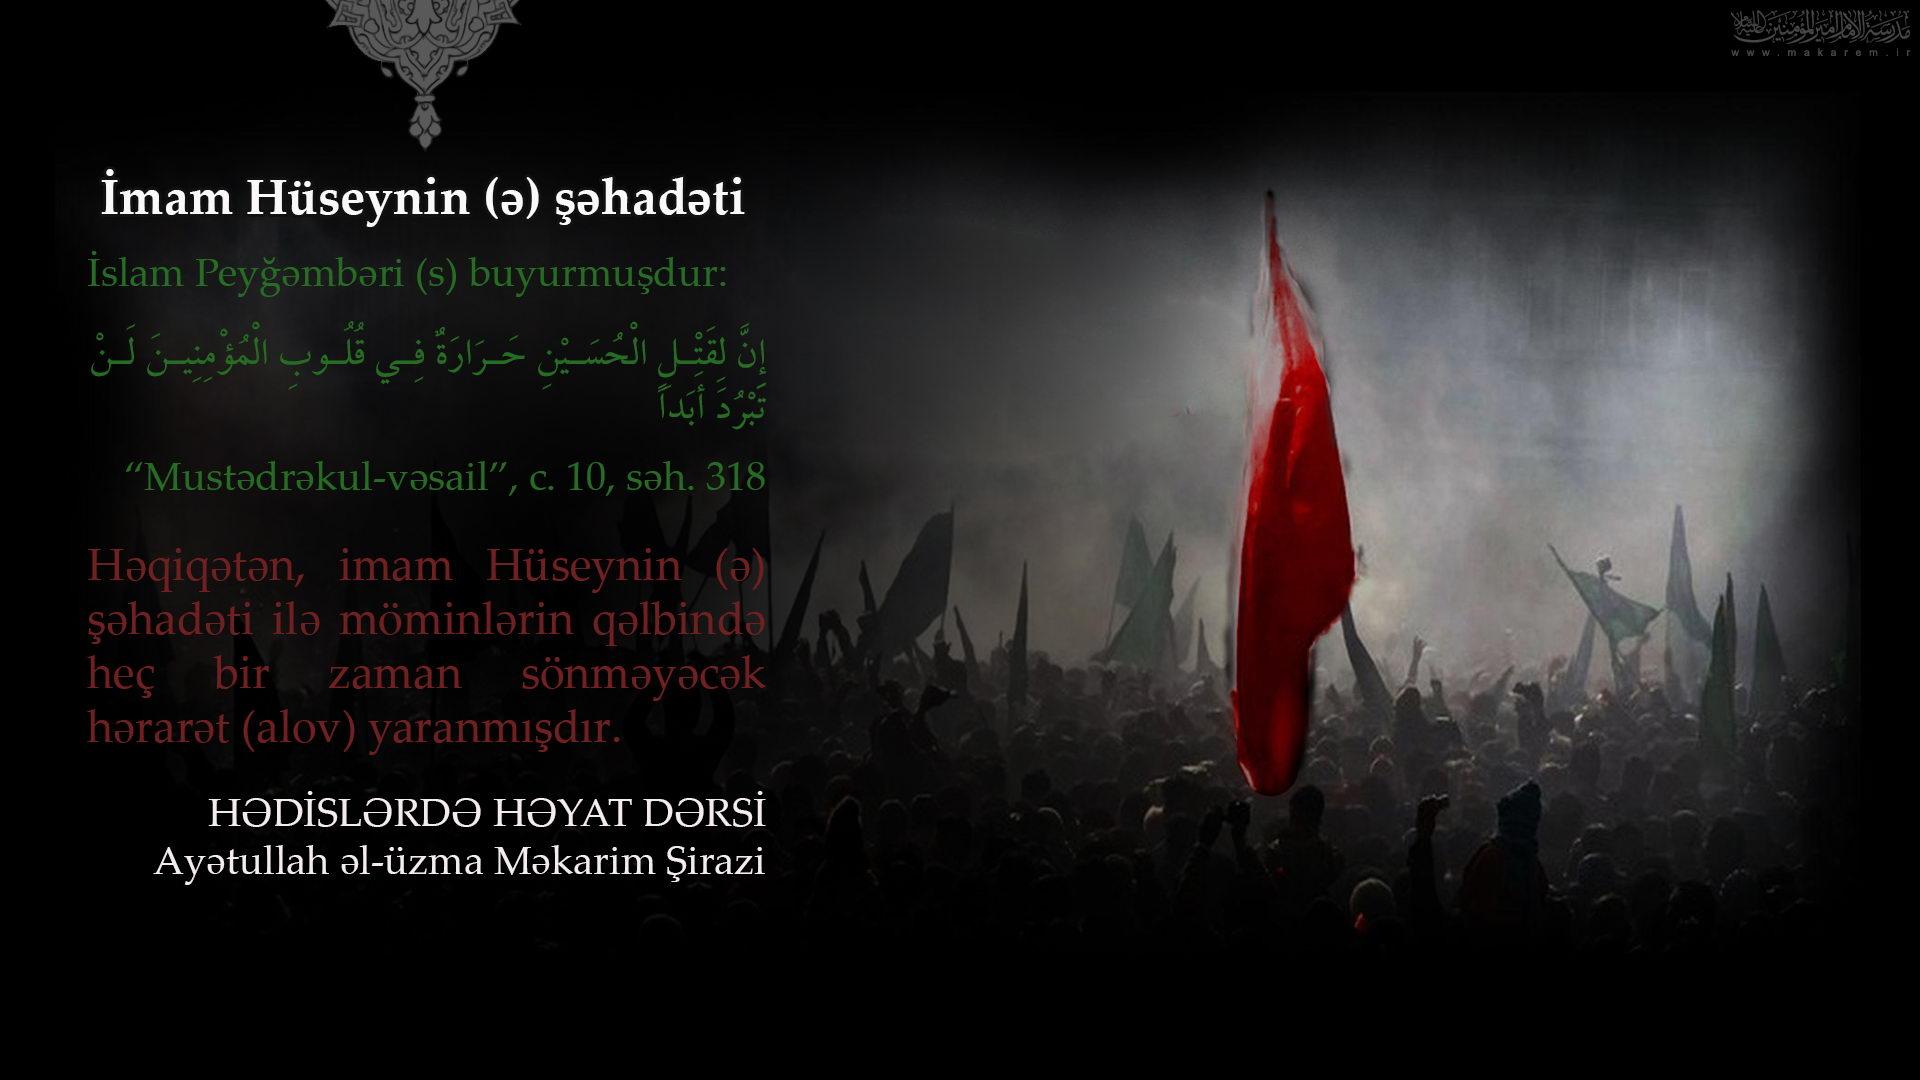 150-010-مدرسه الامام امیر المومنین (ع)